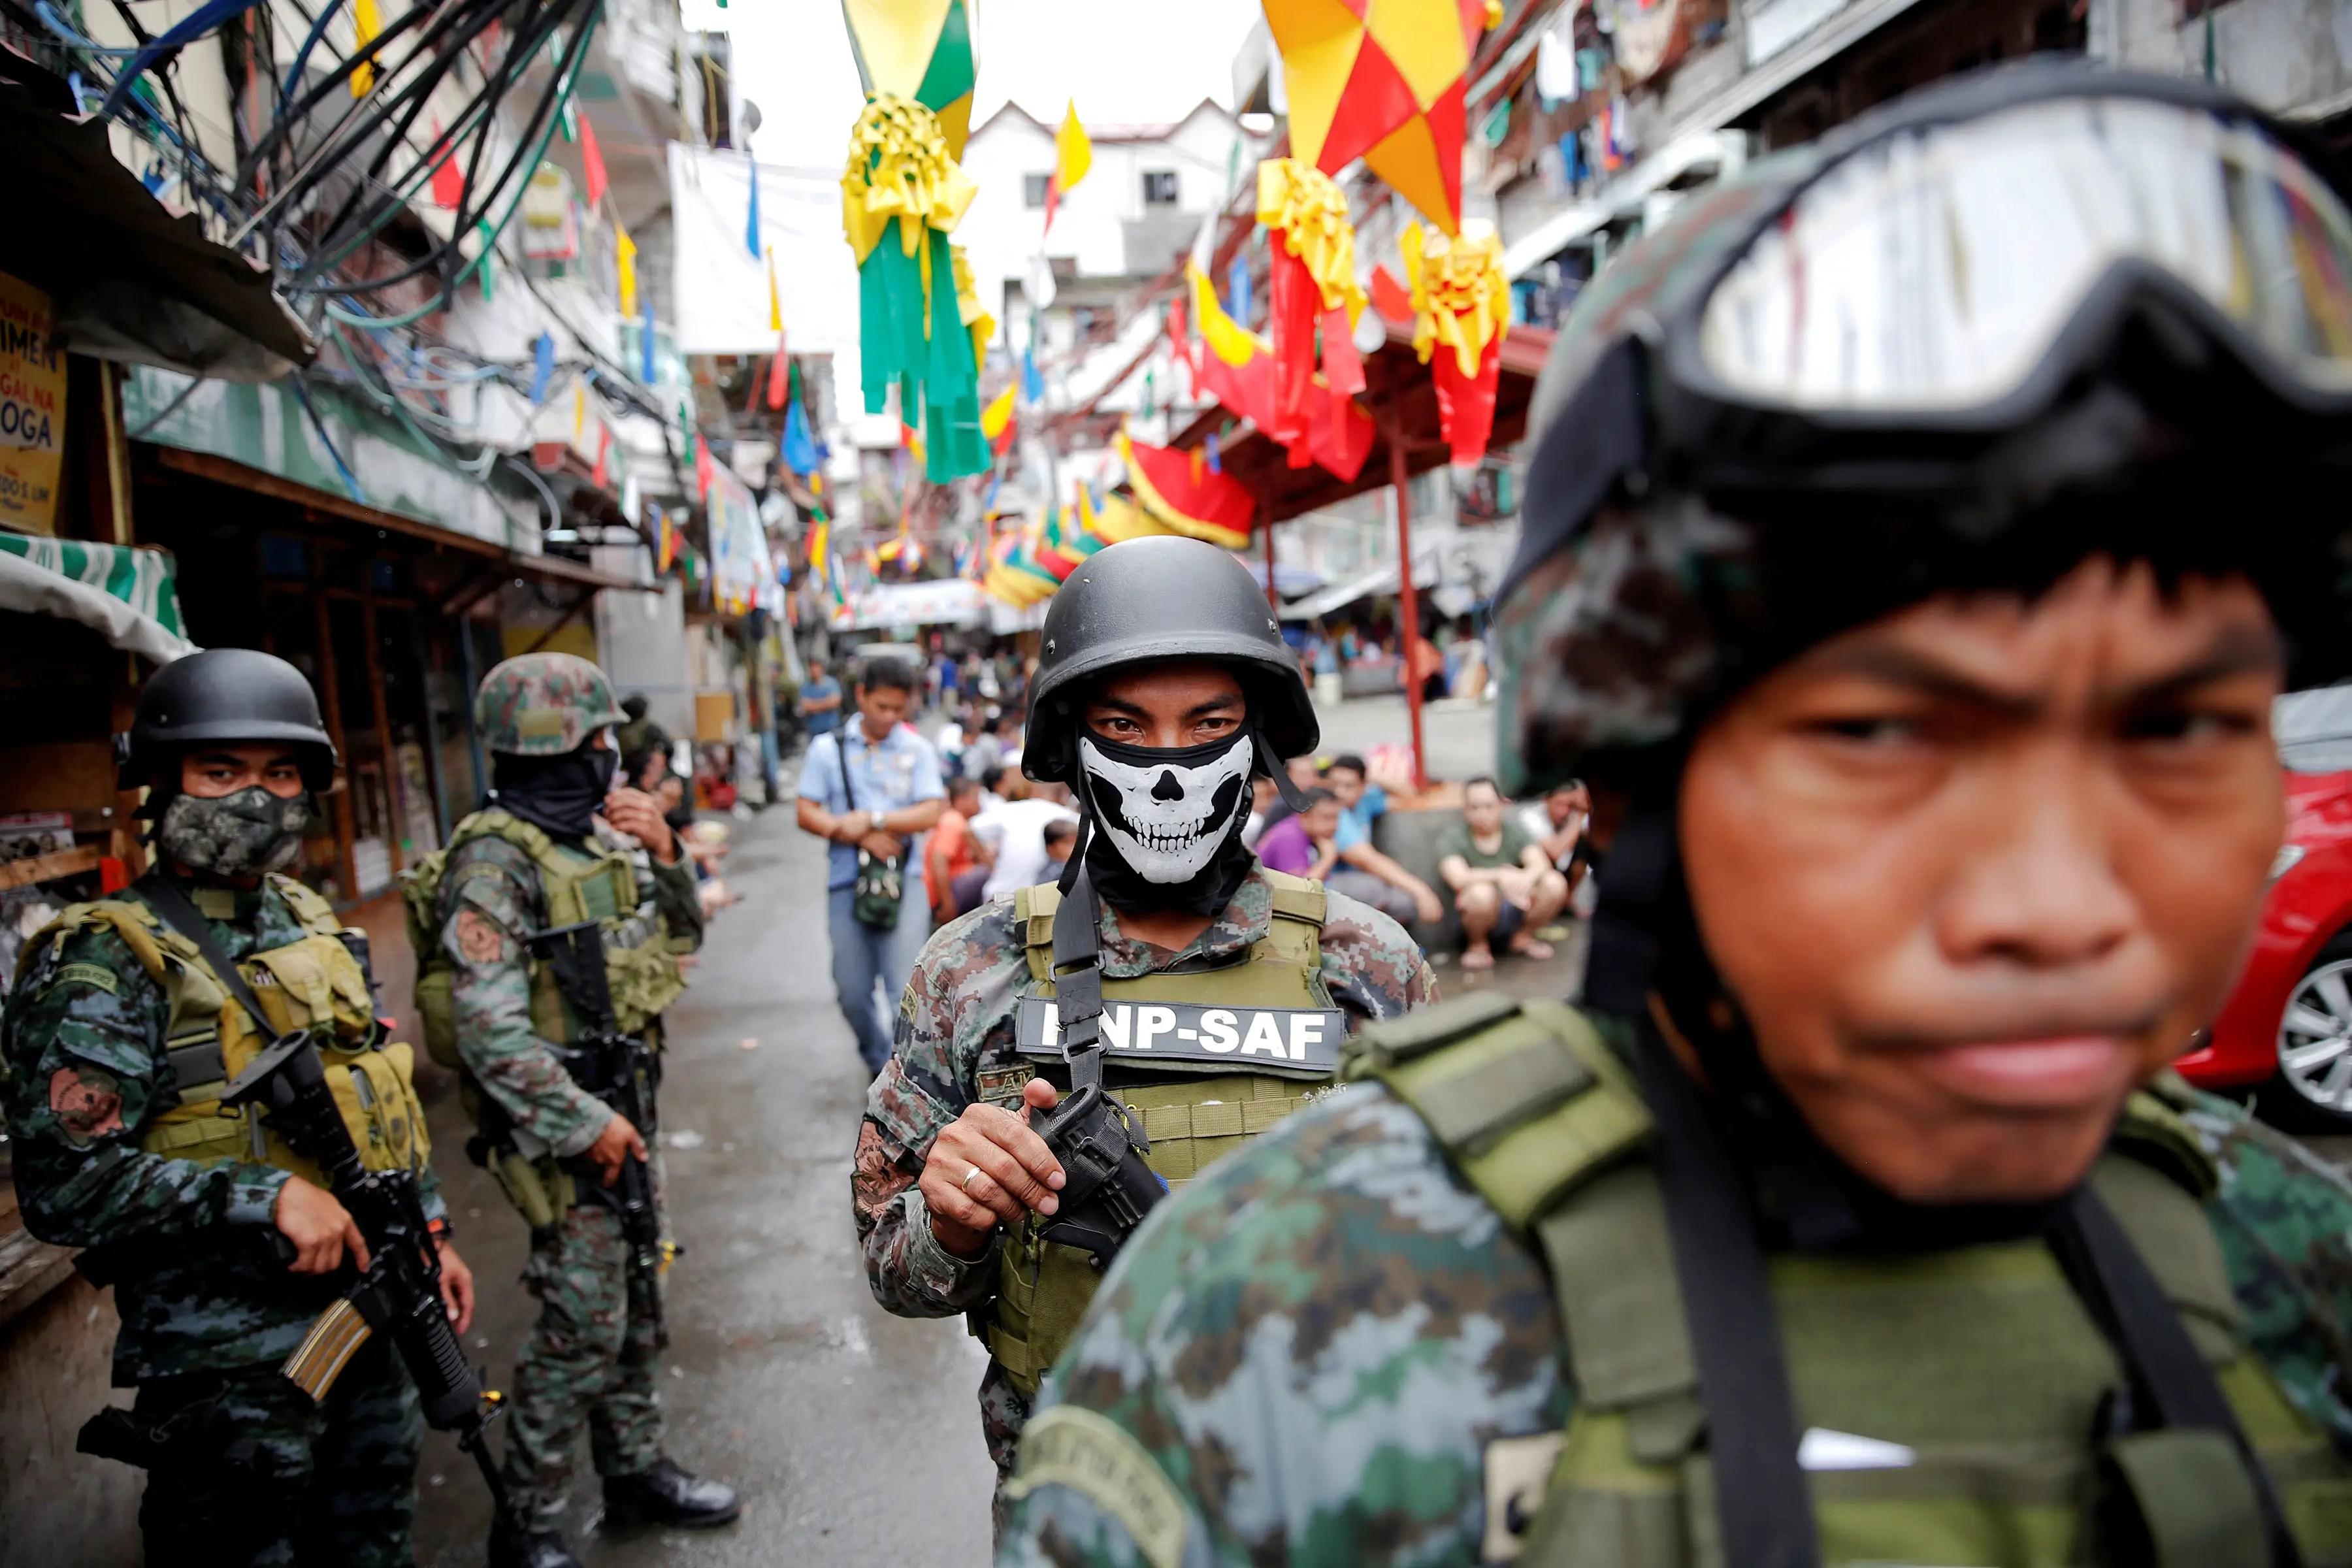 Philippines police troops security forces Manila Rodrigo Duterte war on drugs crime violence